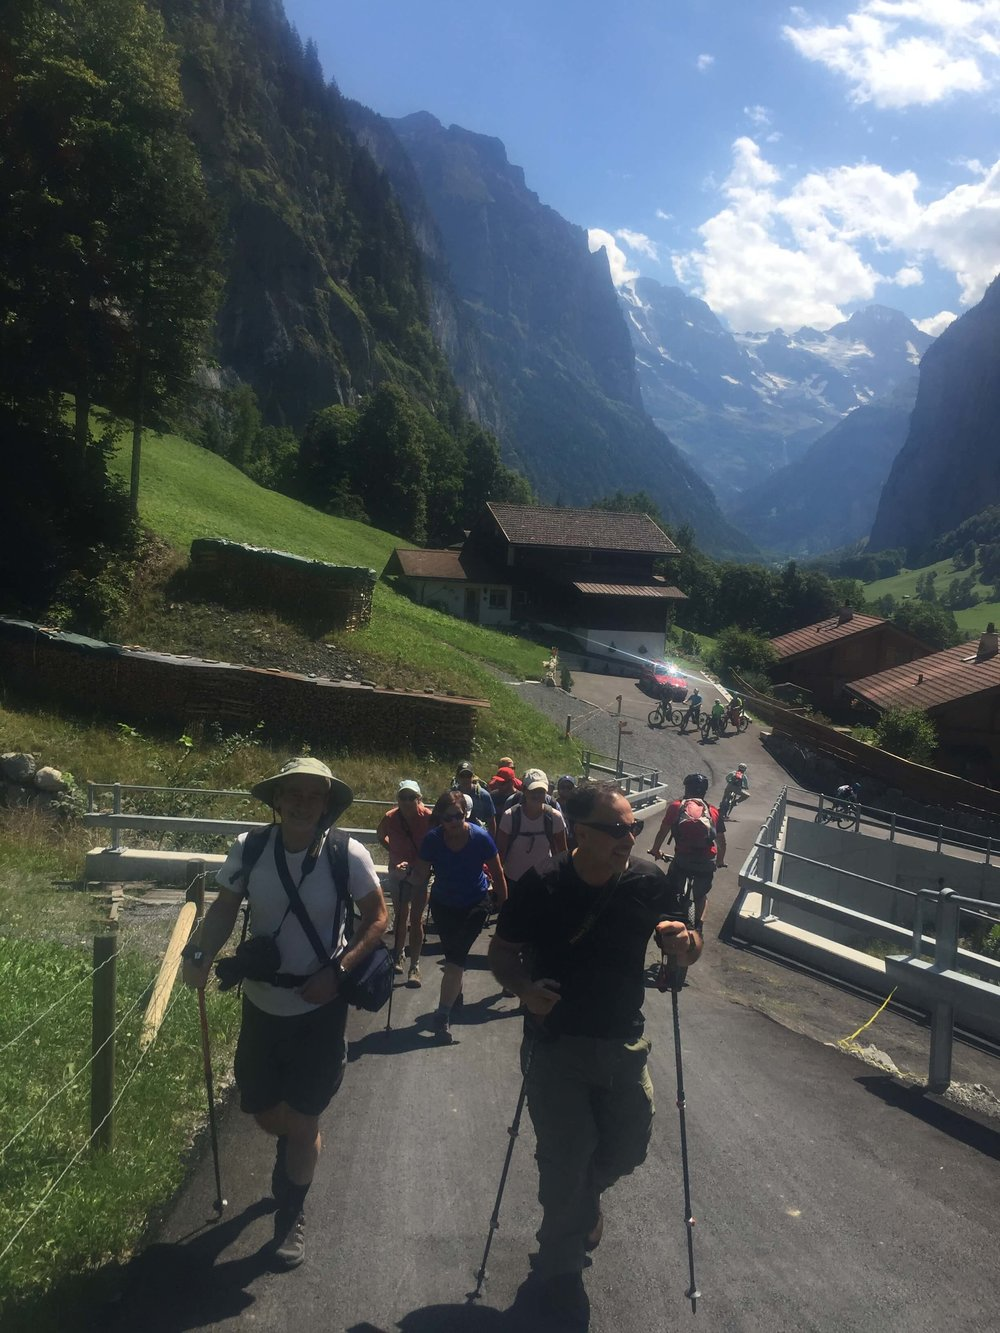 jungfrau swiss alps hiking tour.JPG